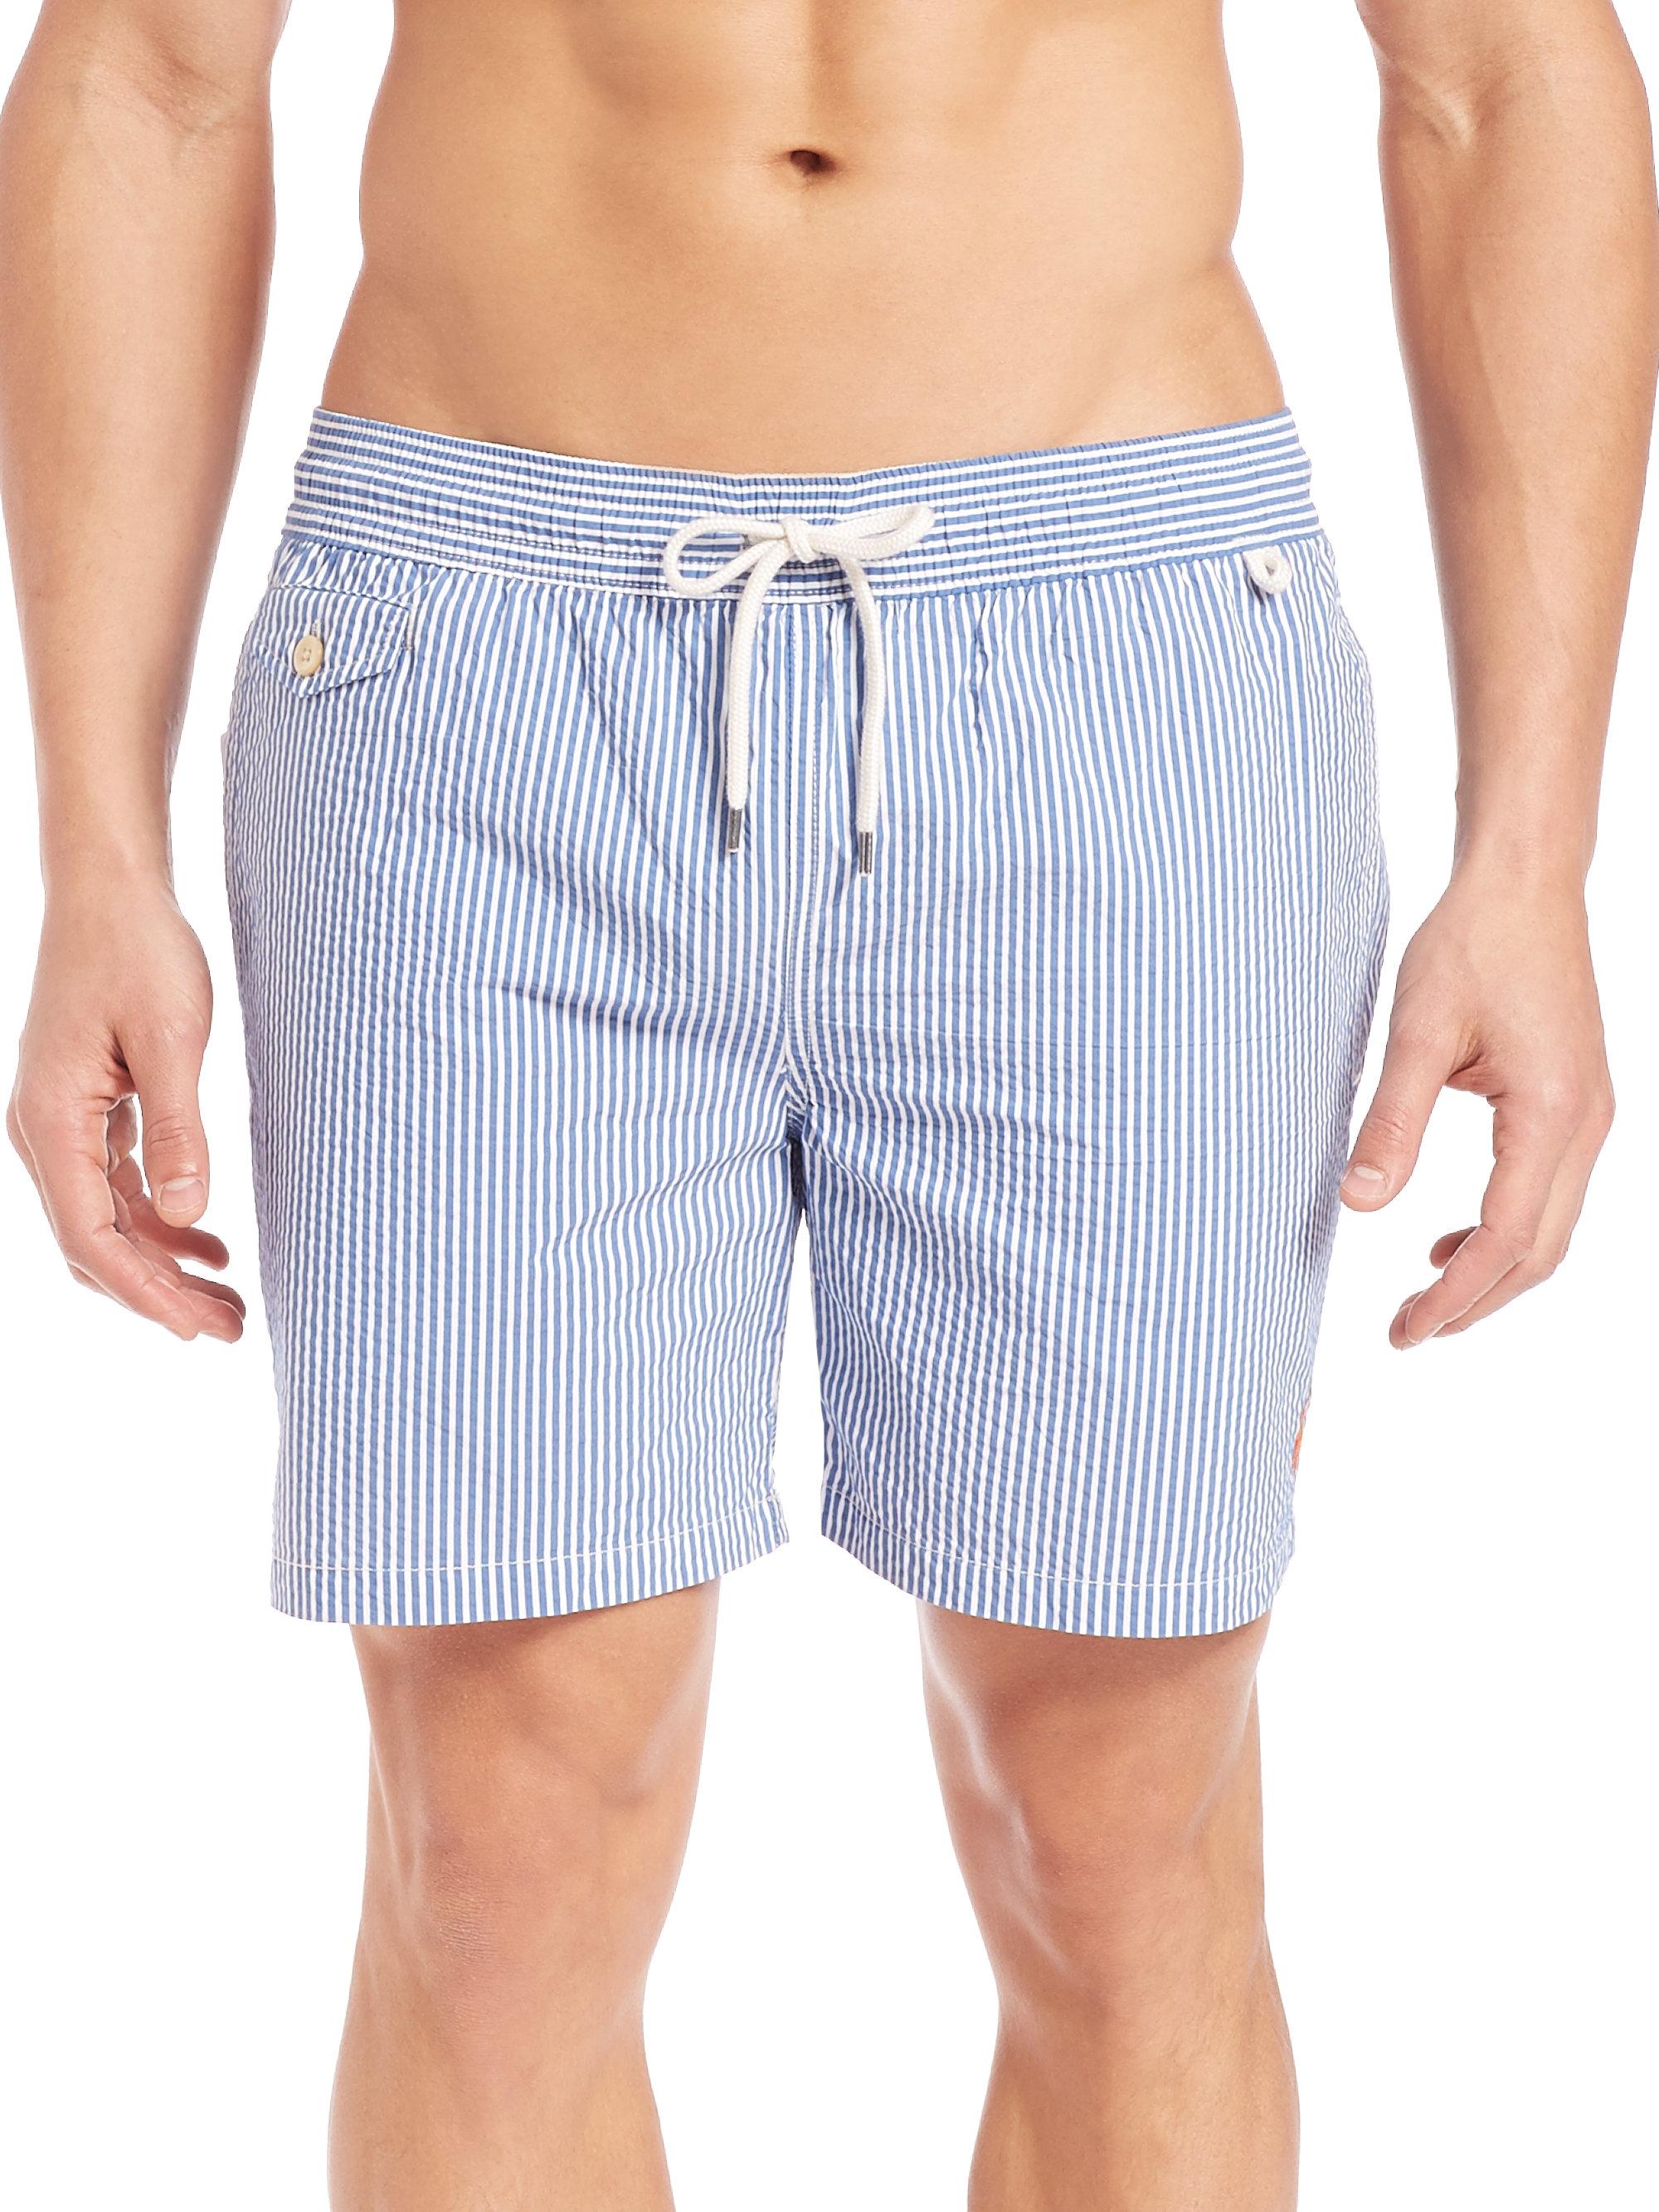 711d33f656 Polo Ralph Lauren Seersucker Traveler Swim Shorts in Blue for Men - Lyst